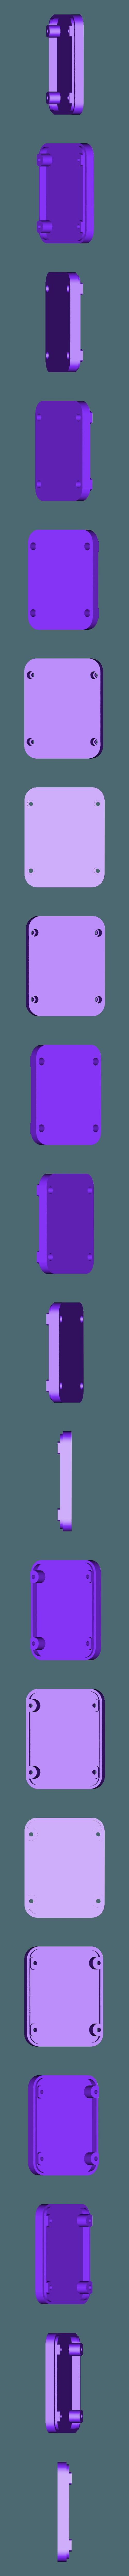 Brain_Box_Upper.stl Download free STL file Experimental Multirotor • 3D printable model, SeanTheITGuy